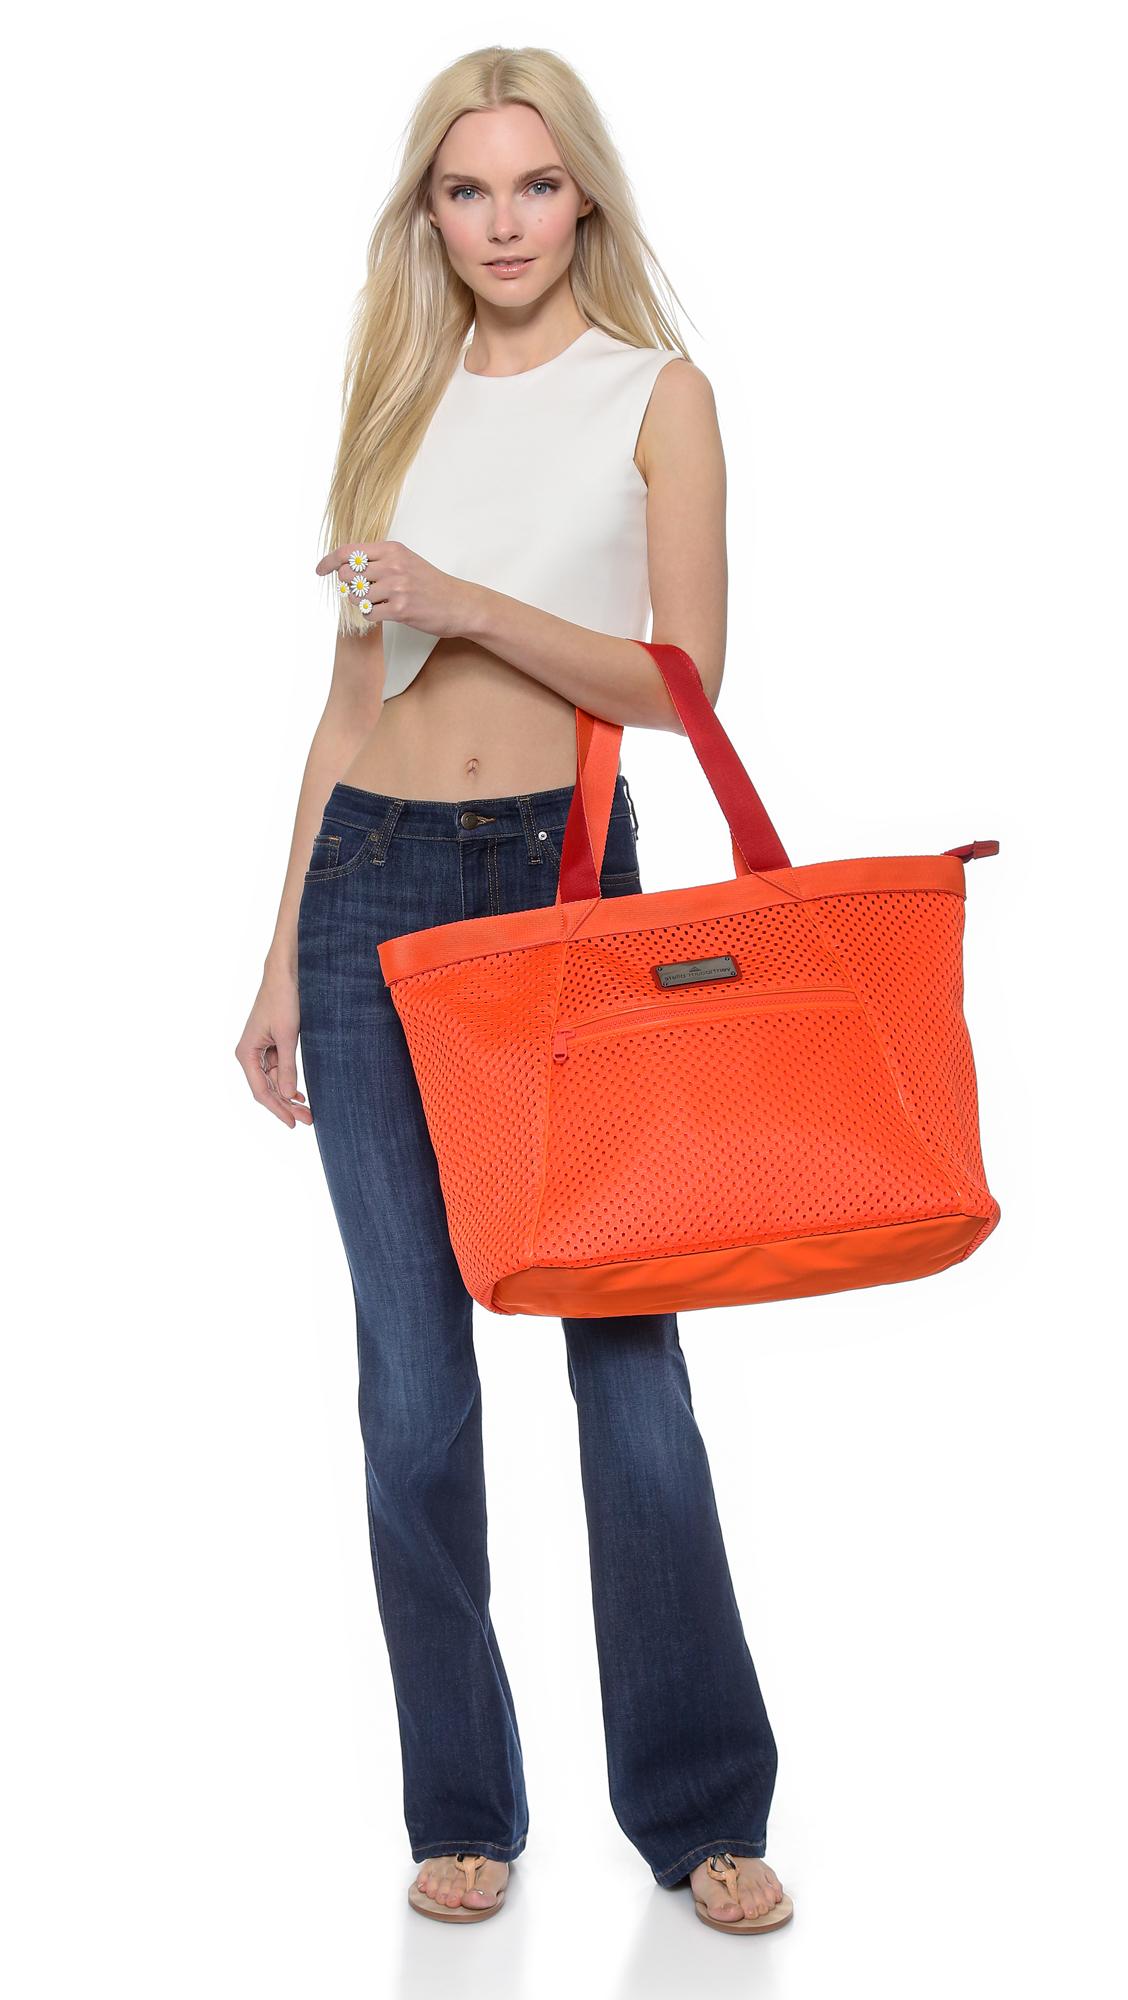 adidas By Stella McCartney Swim Tote - Toasted Orange